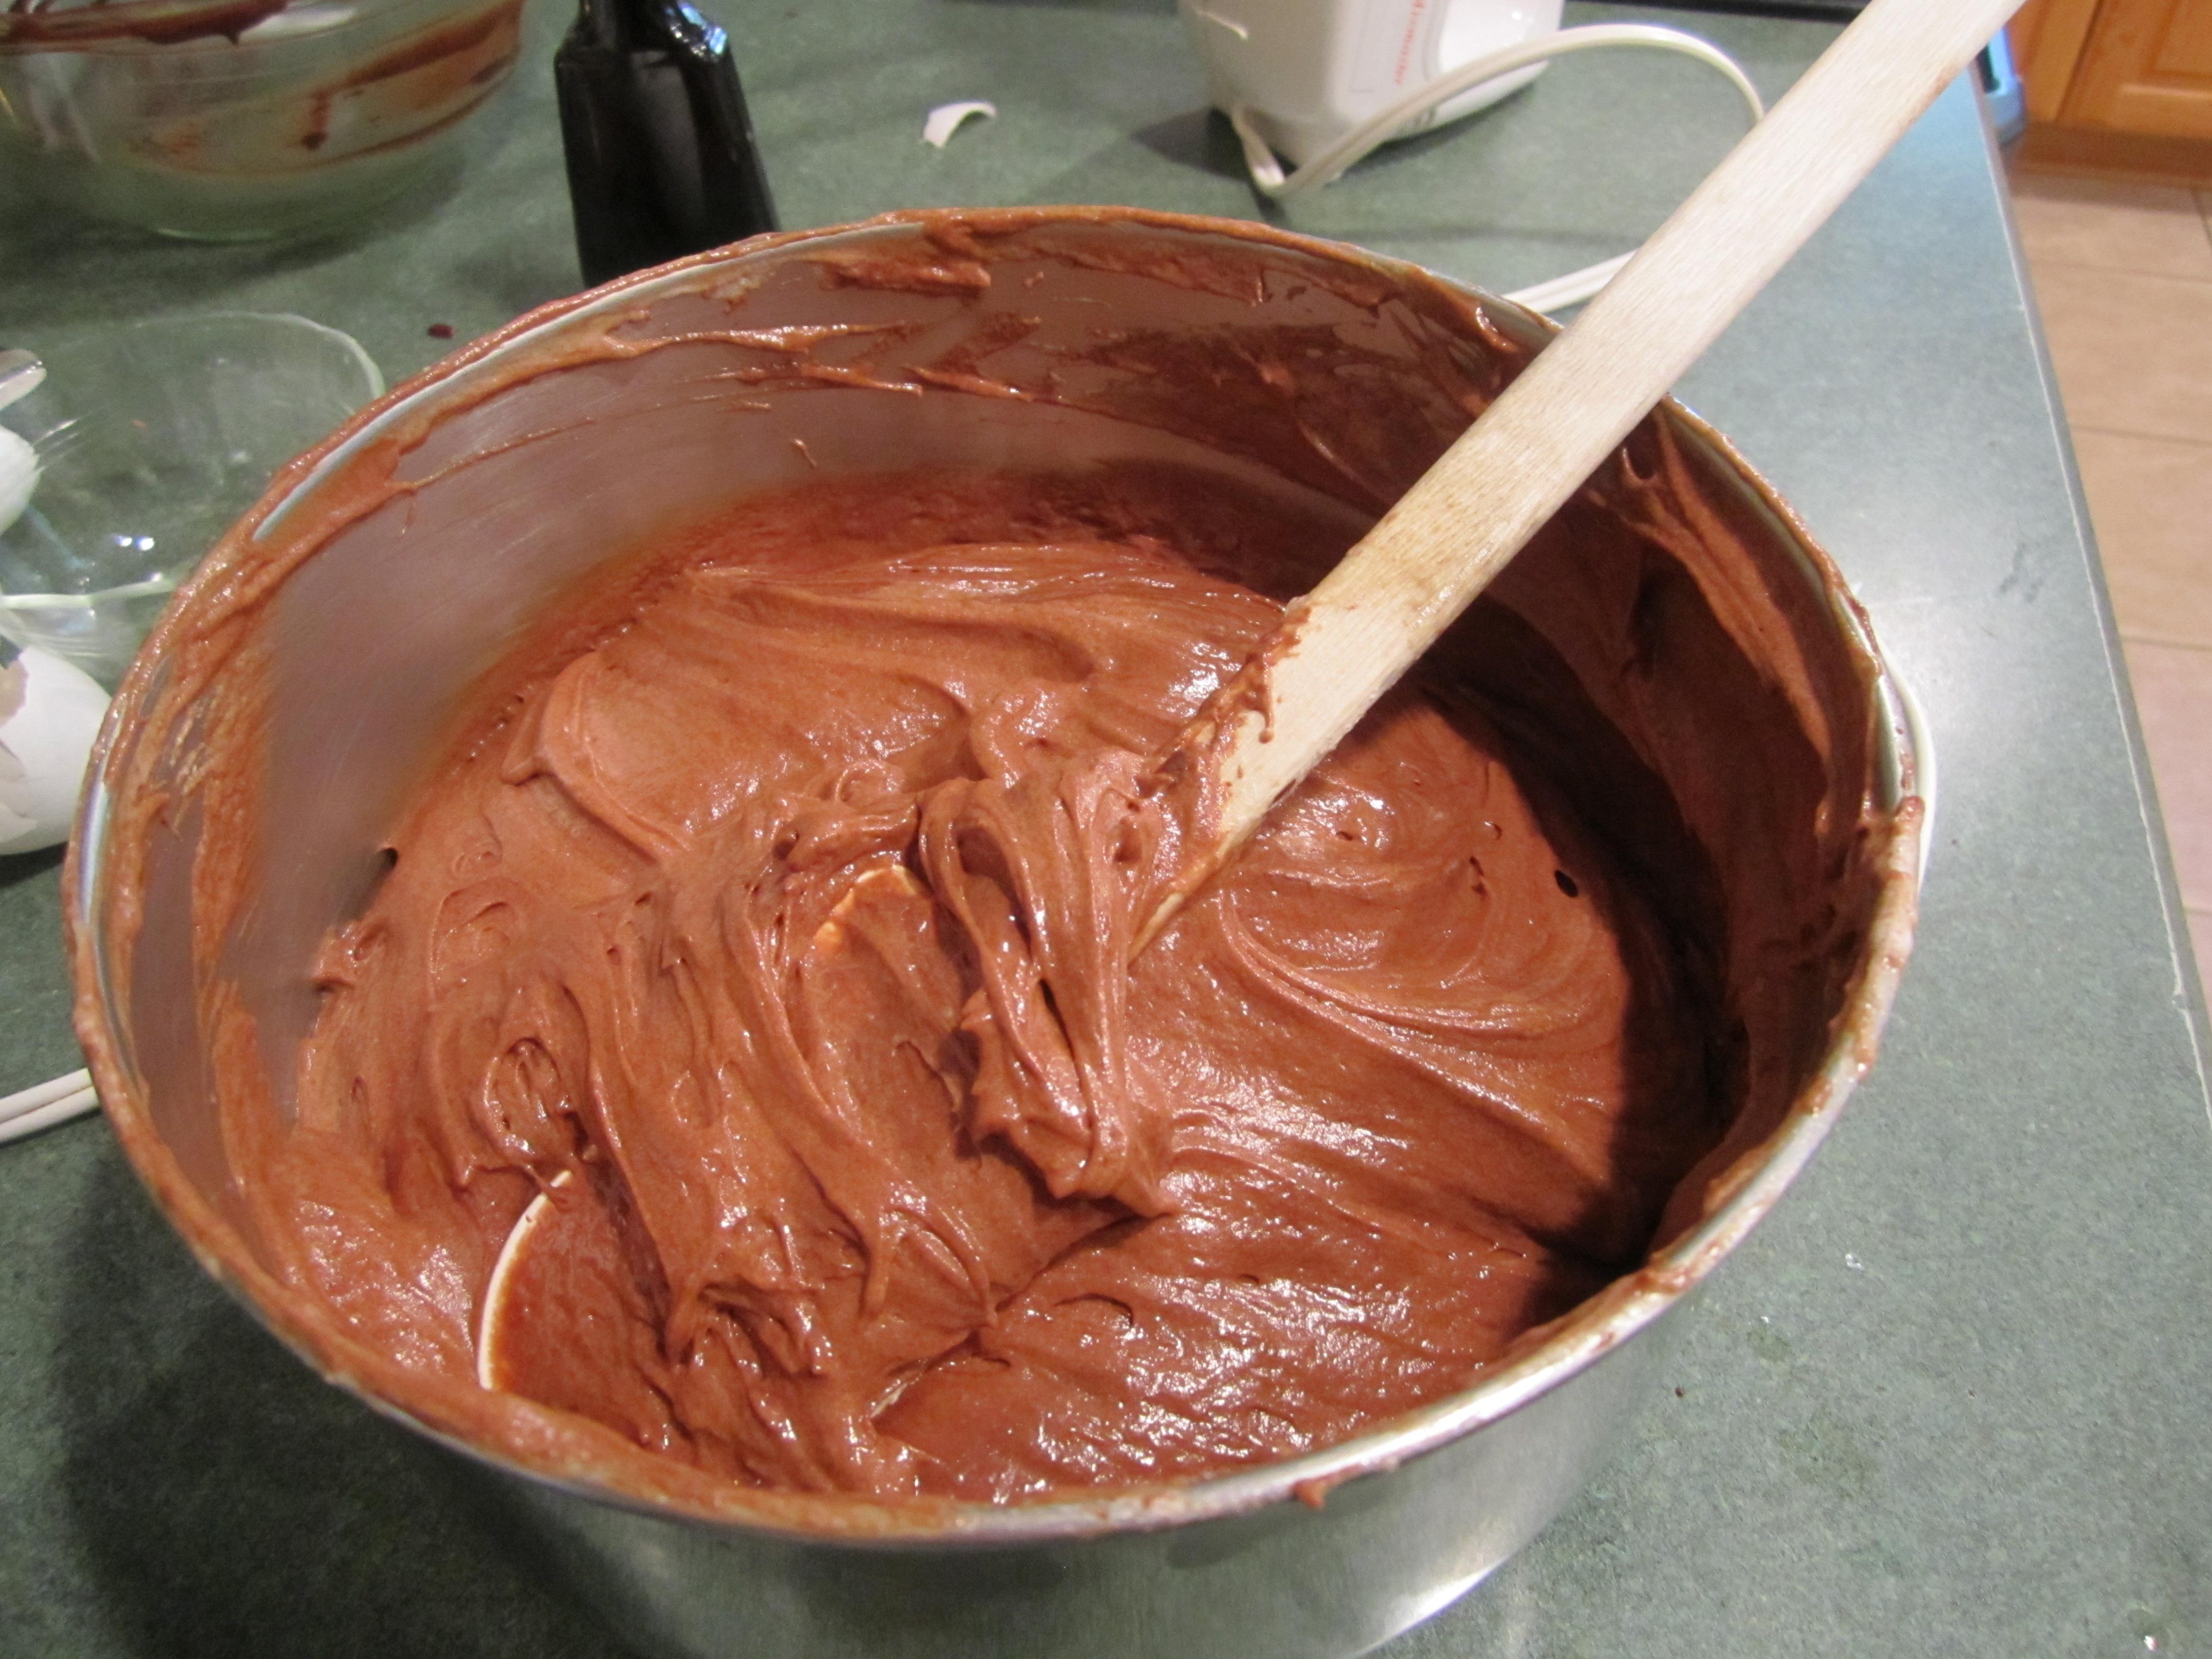 Chocolate Flourless Cake With Chocolate Glaze Perfecting